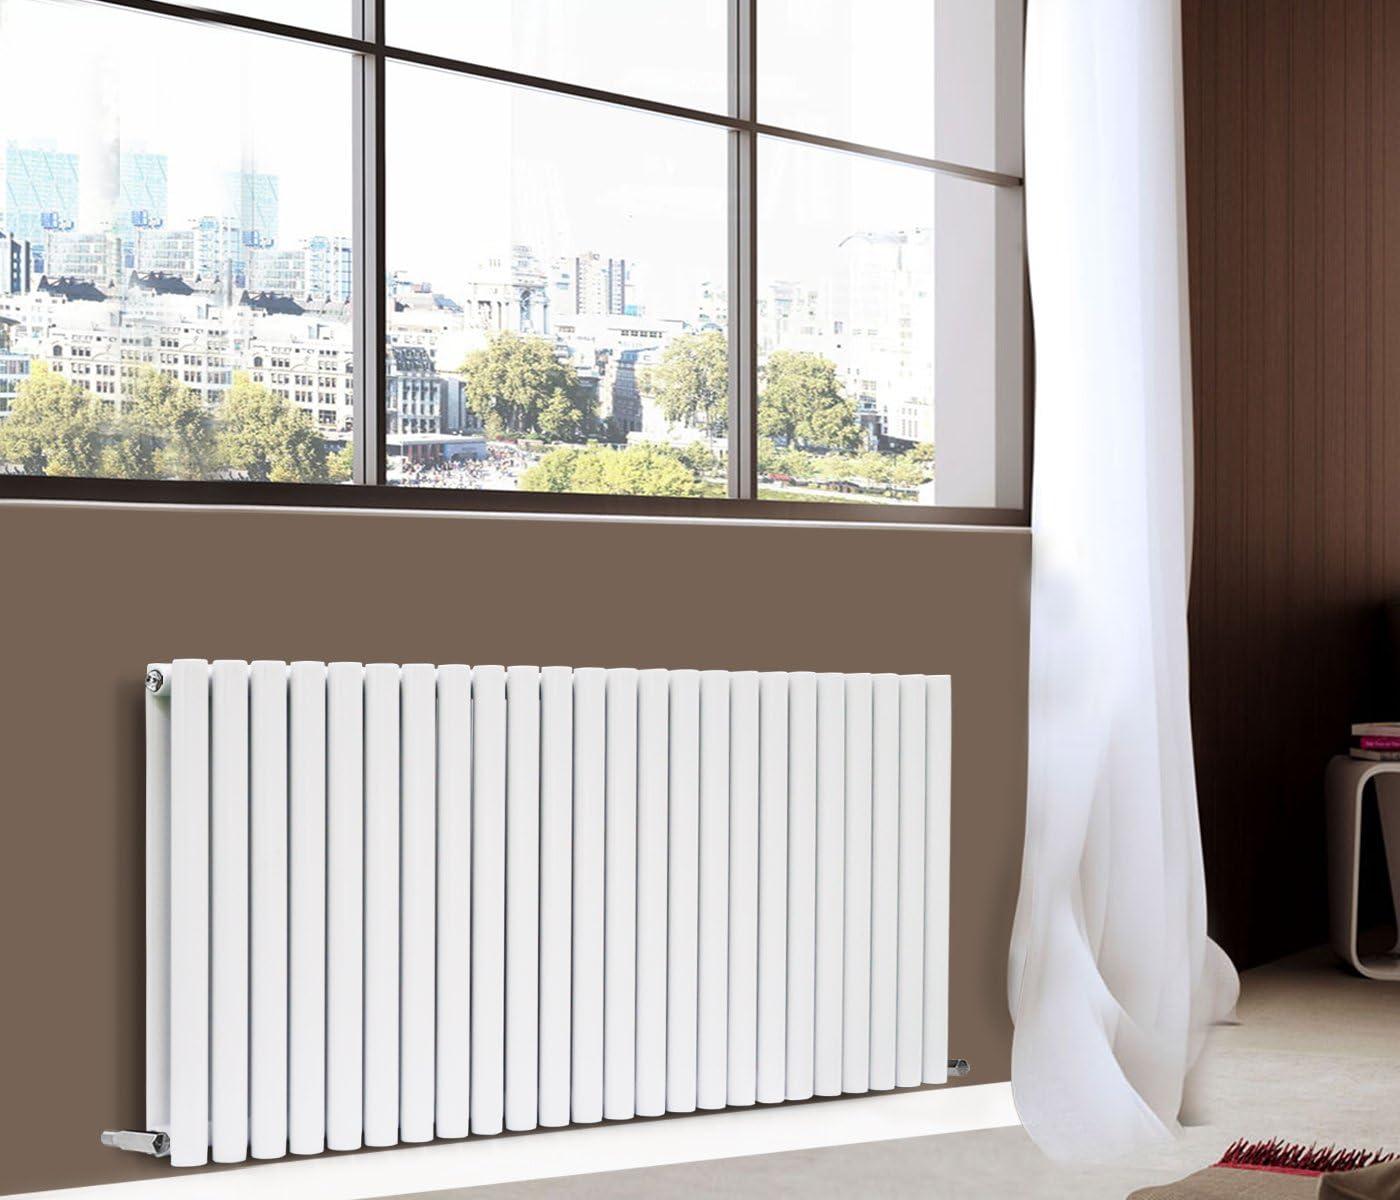 NRG 600x1416mm White Double Panel Horizontal Oval Column Designer Radiator Modern Bathroom Central Heating 15 Year Guarantee